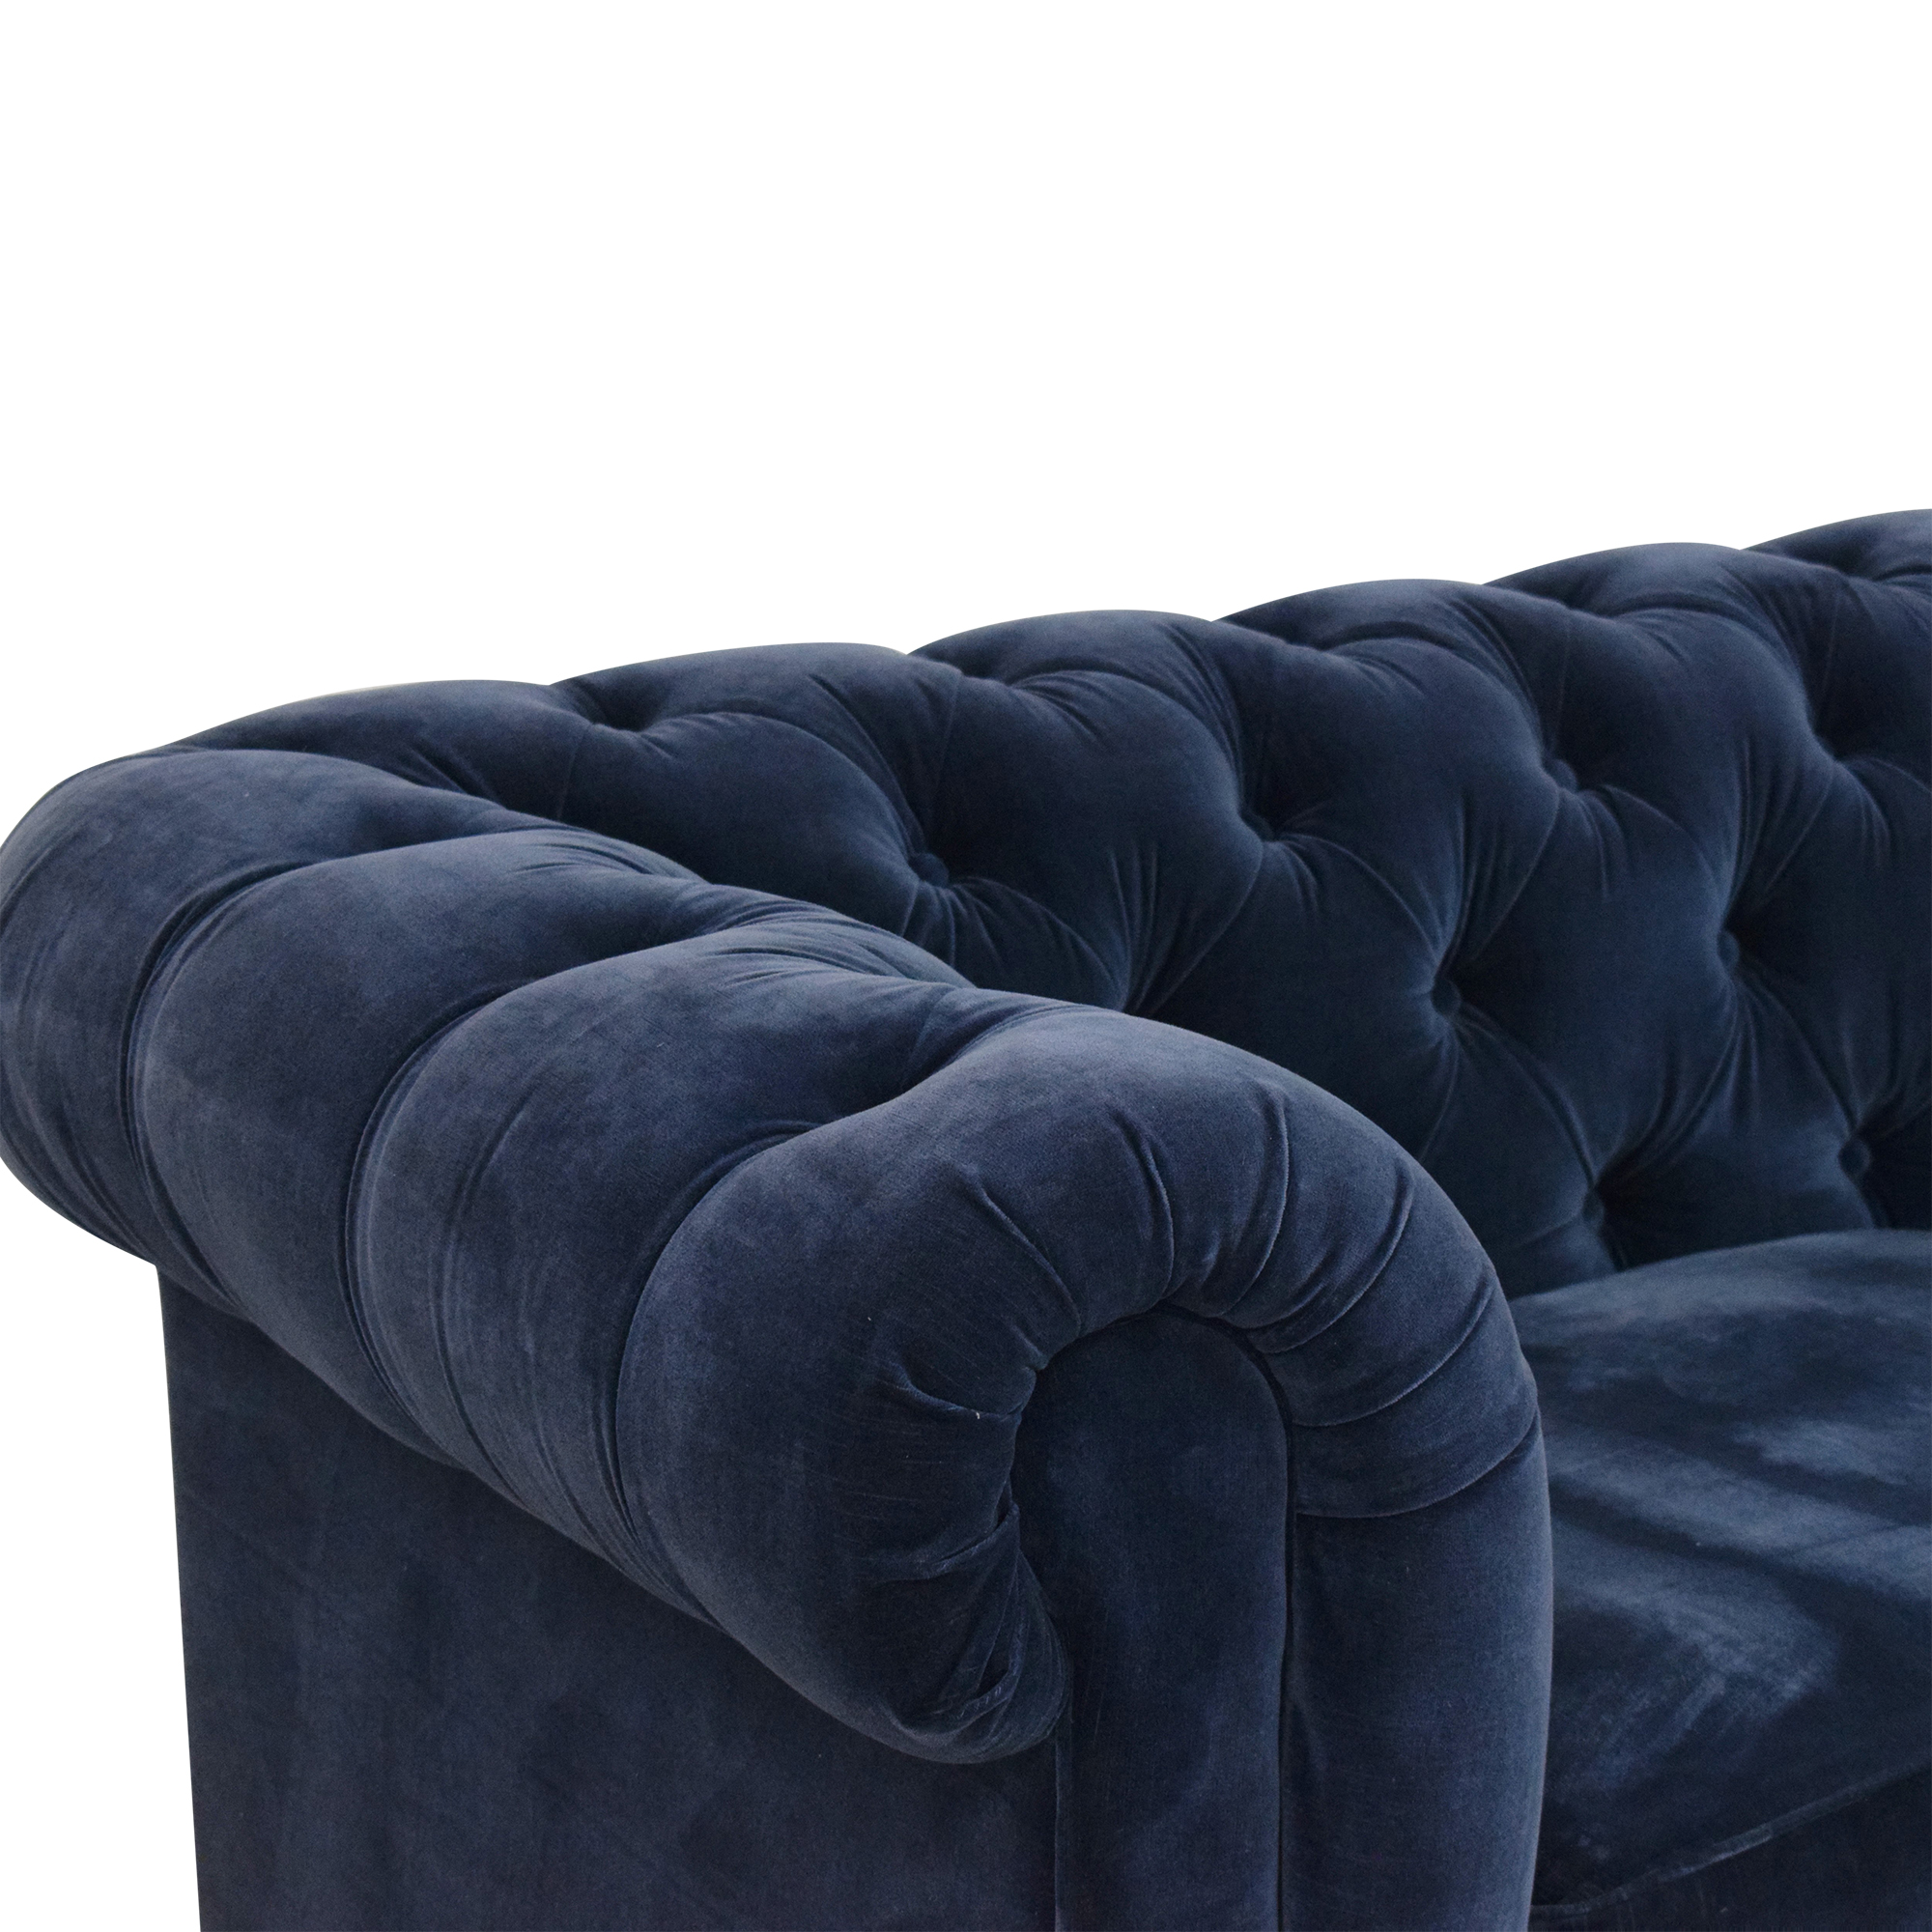 buy Restoration Hardware Kensington Sofa Restoration Hardware Classic Sofas